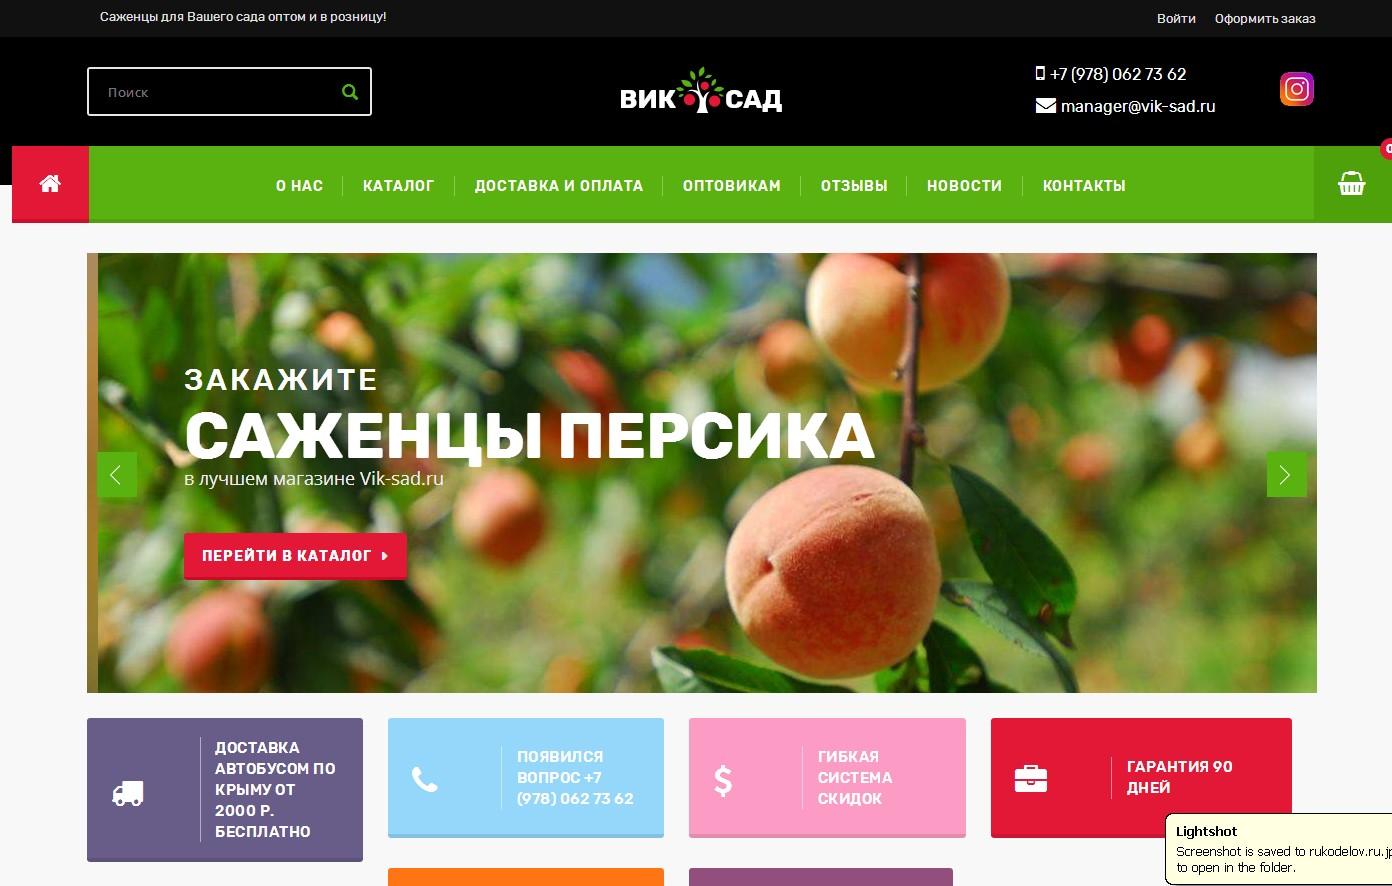 логотип vik-sad.ru